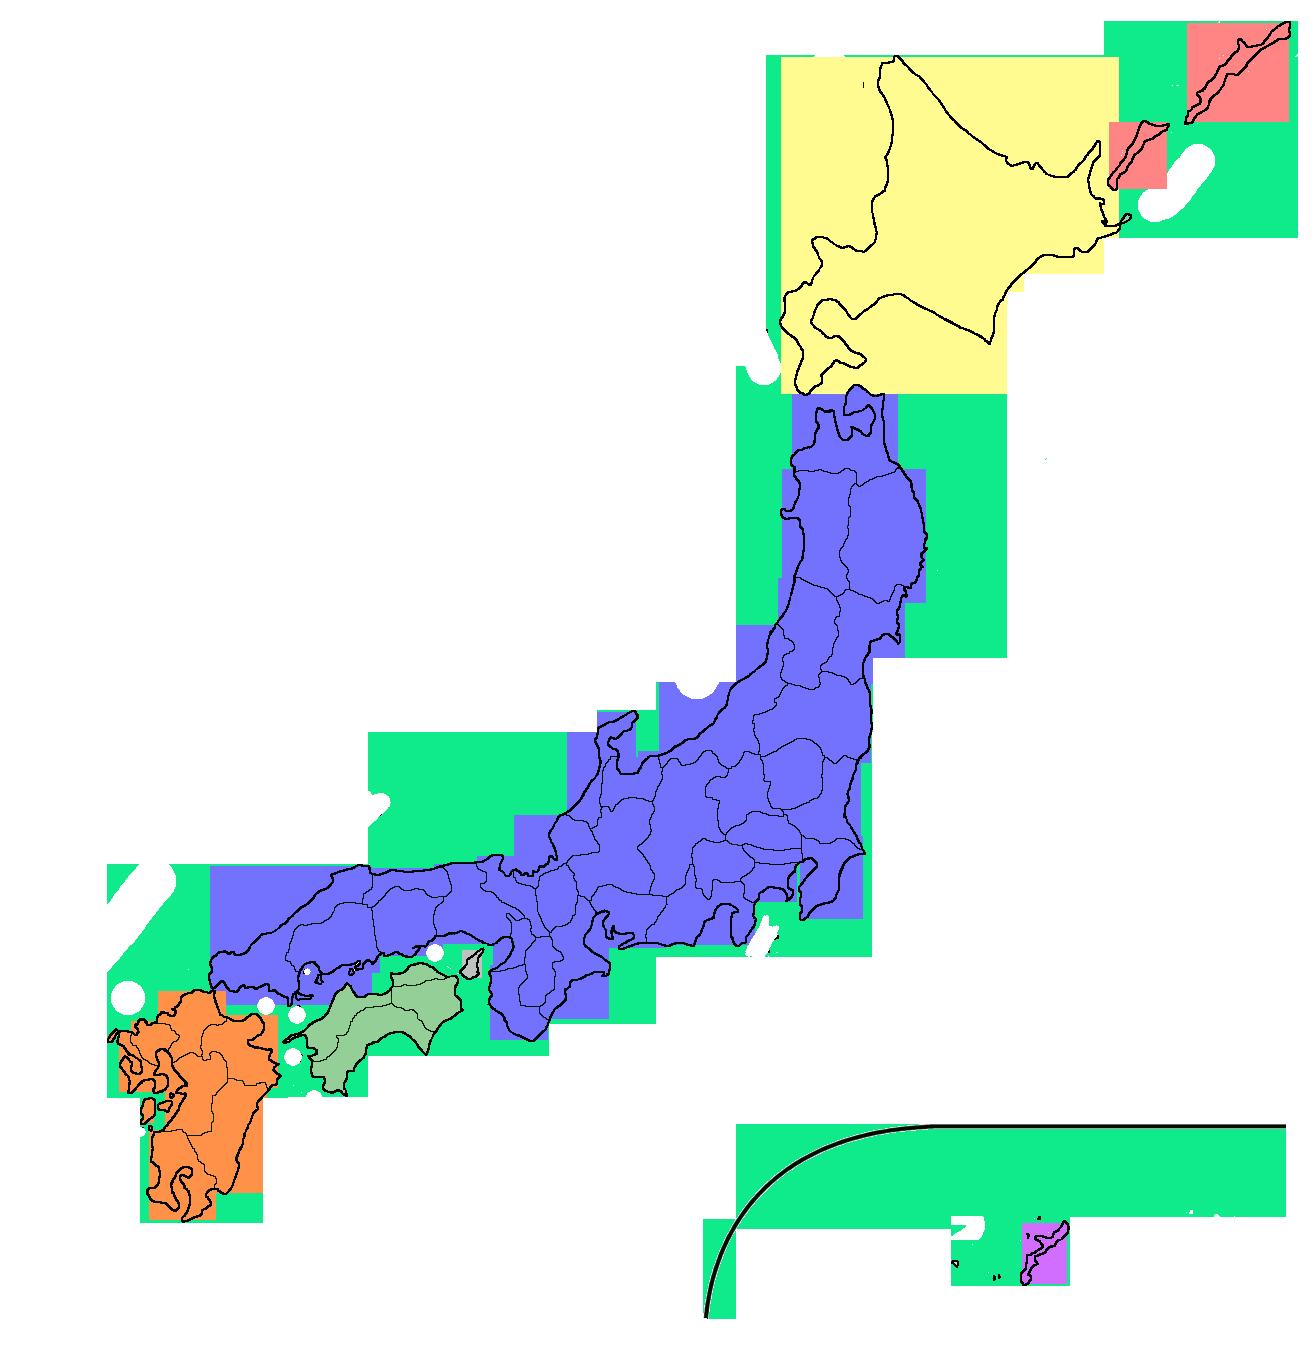 FileJapanese Islandspng Wikimedia Commons - Japan map 4 main islands